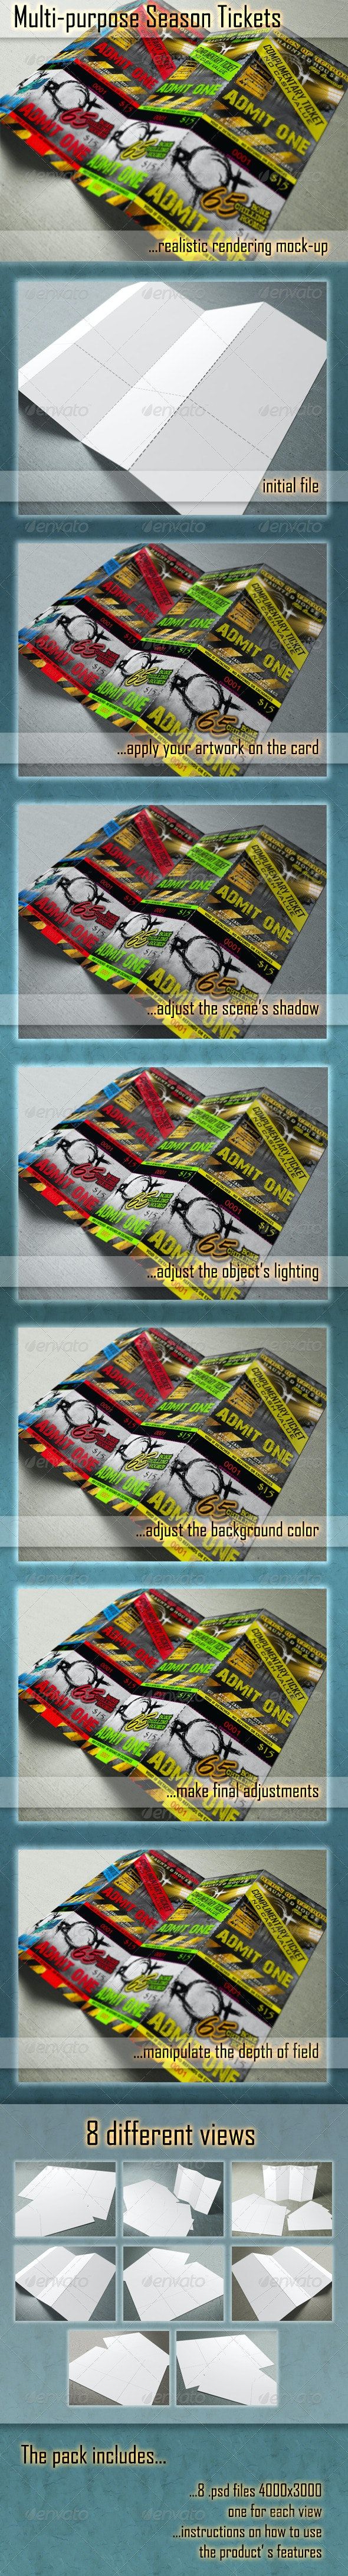 Season Ticket Mockups - Print Product Mock-Ups